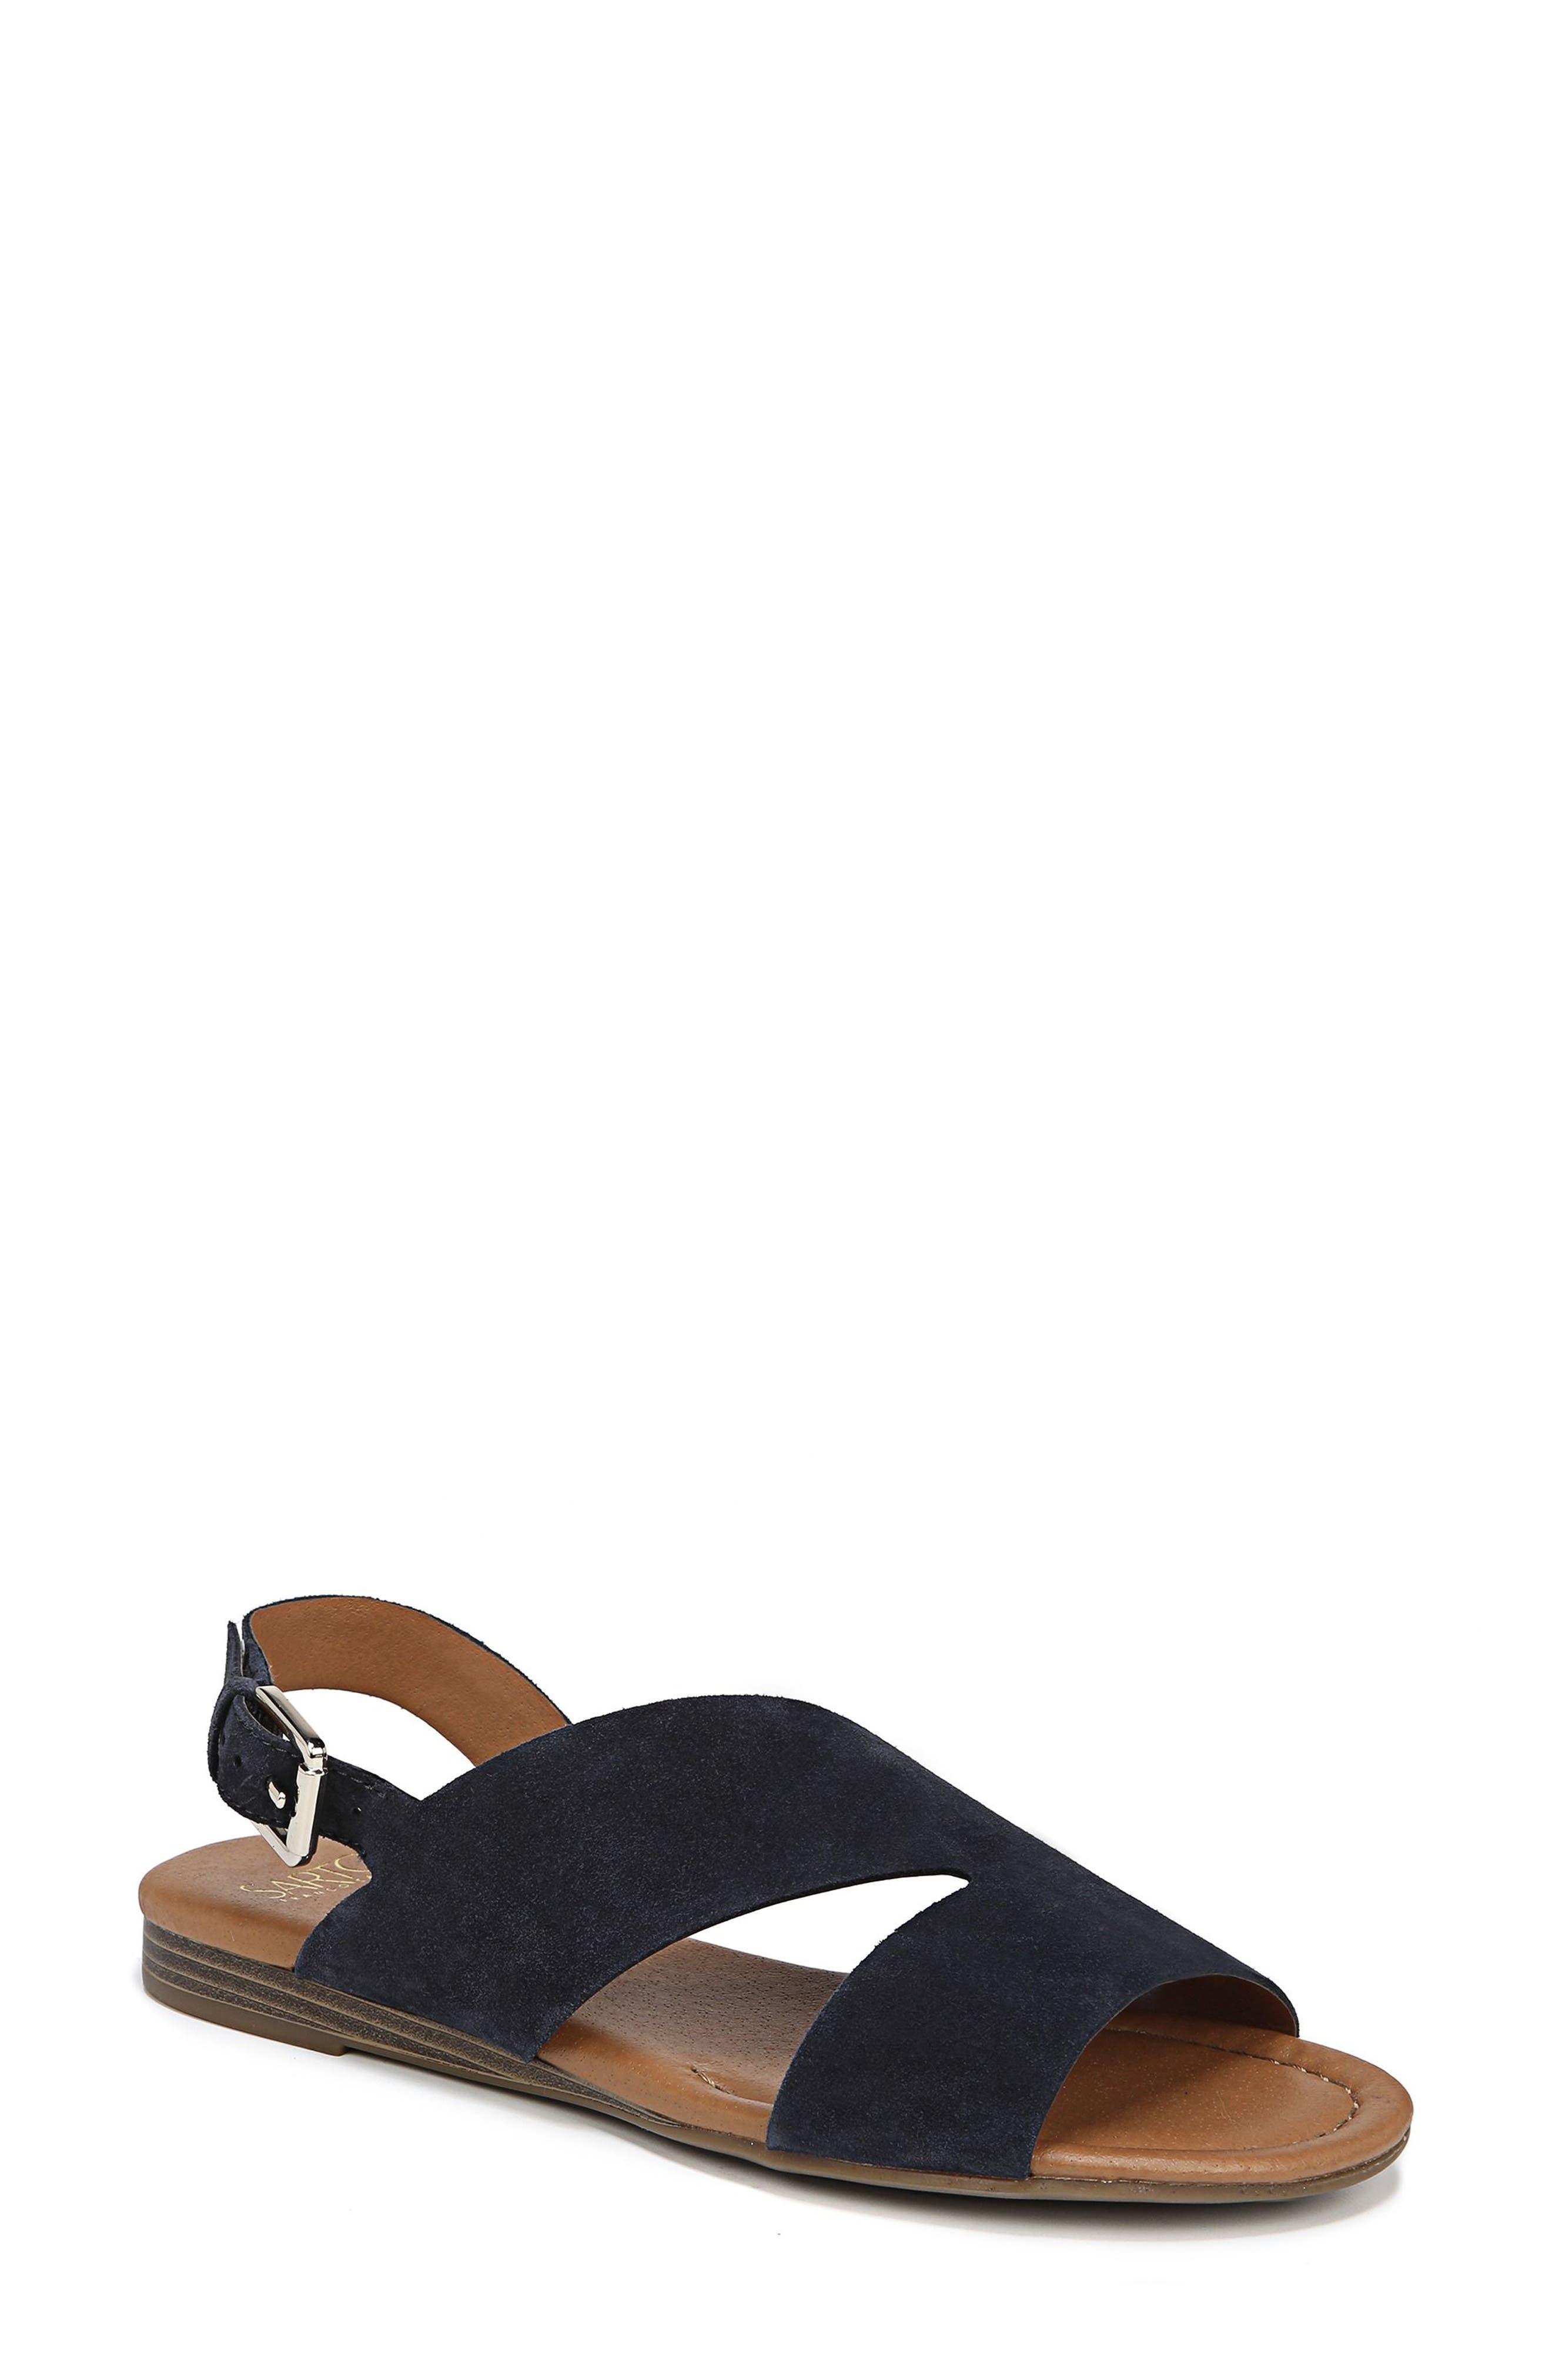 Garza Slingback Sandal,                             Main thumbnail 6, color,